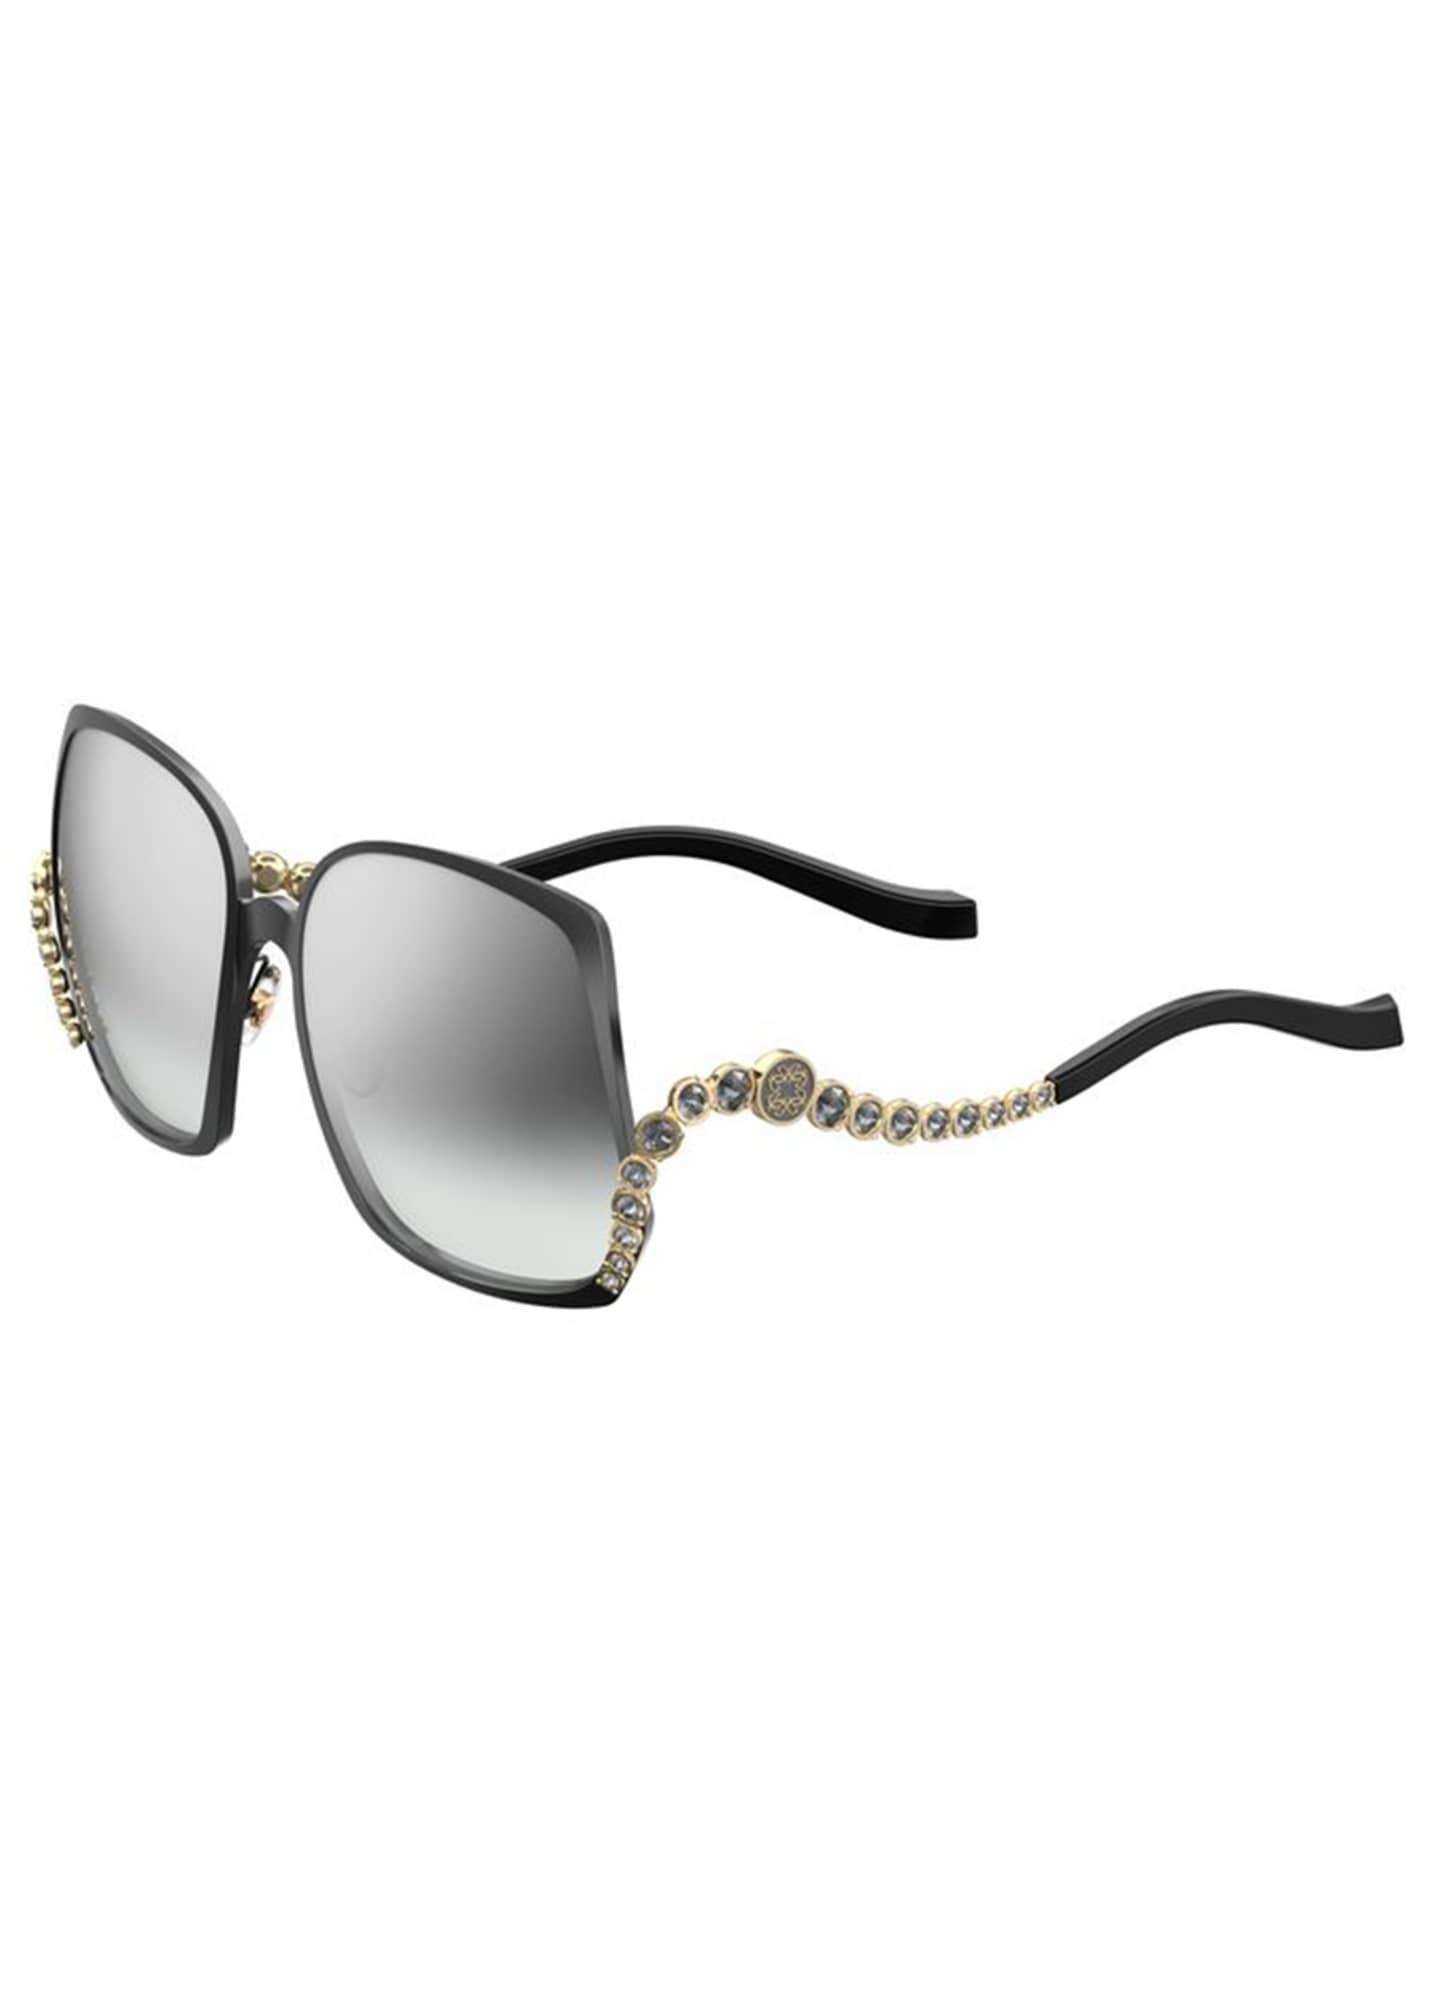 Image 1 of 1: Square Titanium Sunglasses w/ Crystal Wave Arms